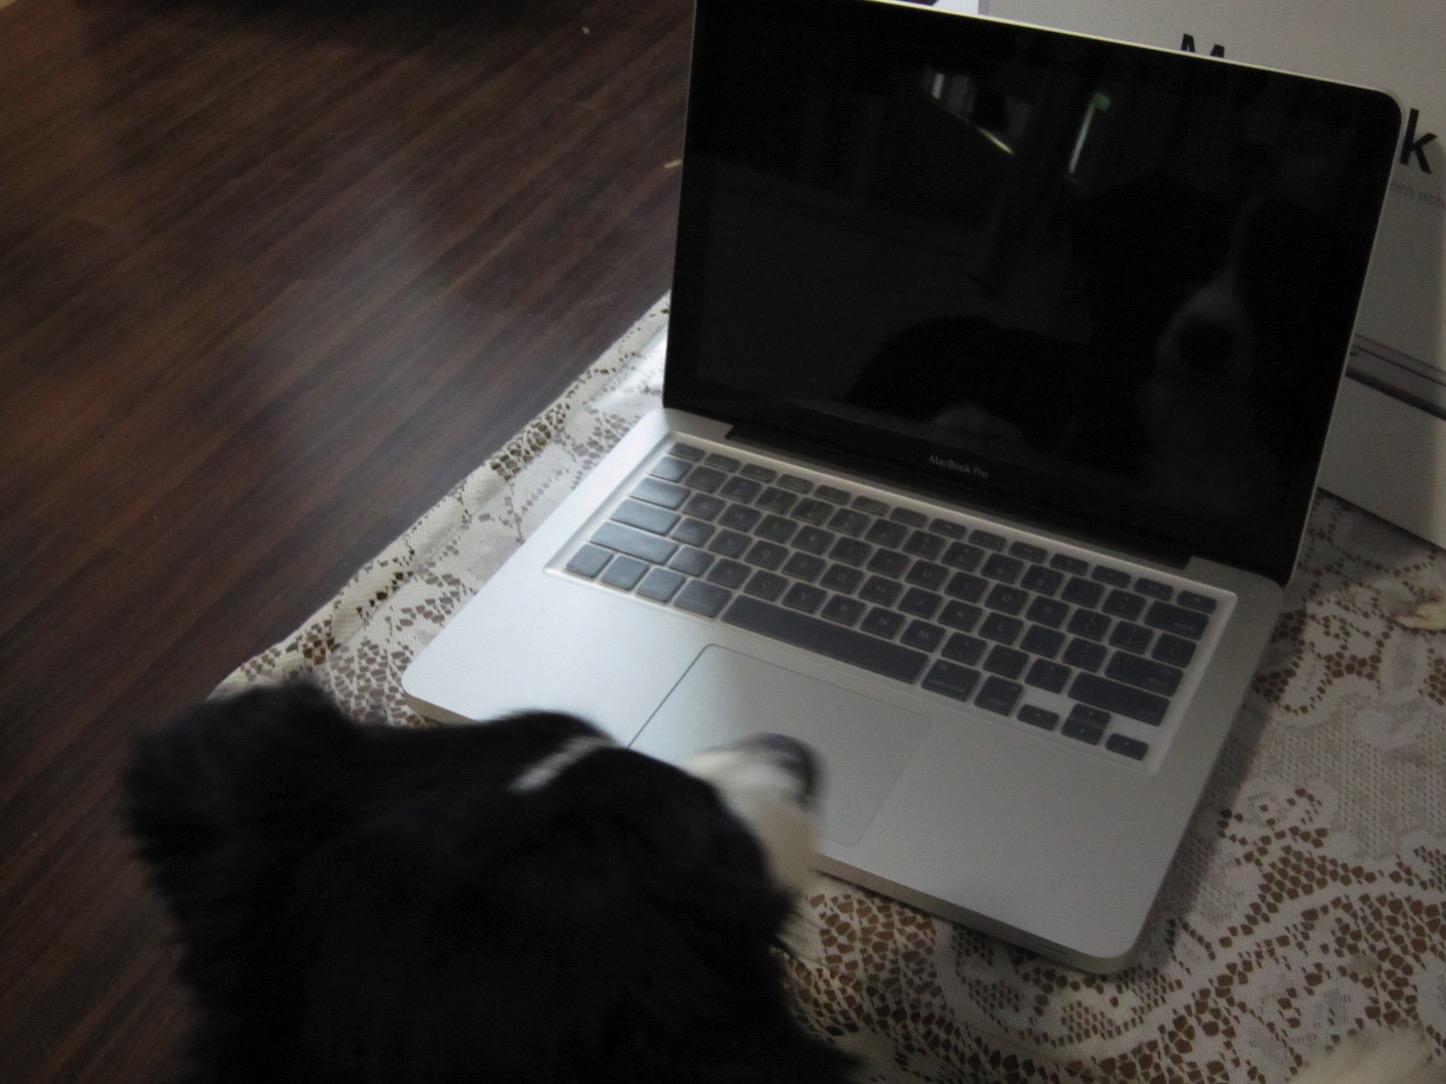 Macbook 13inch and cute dog